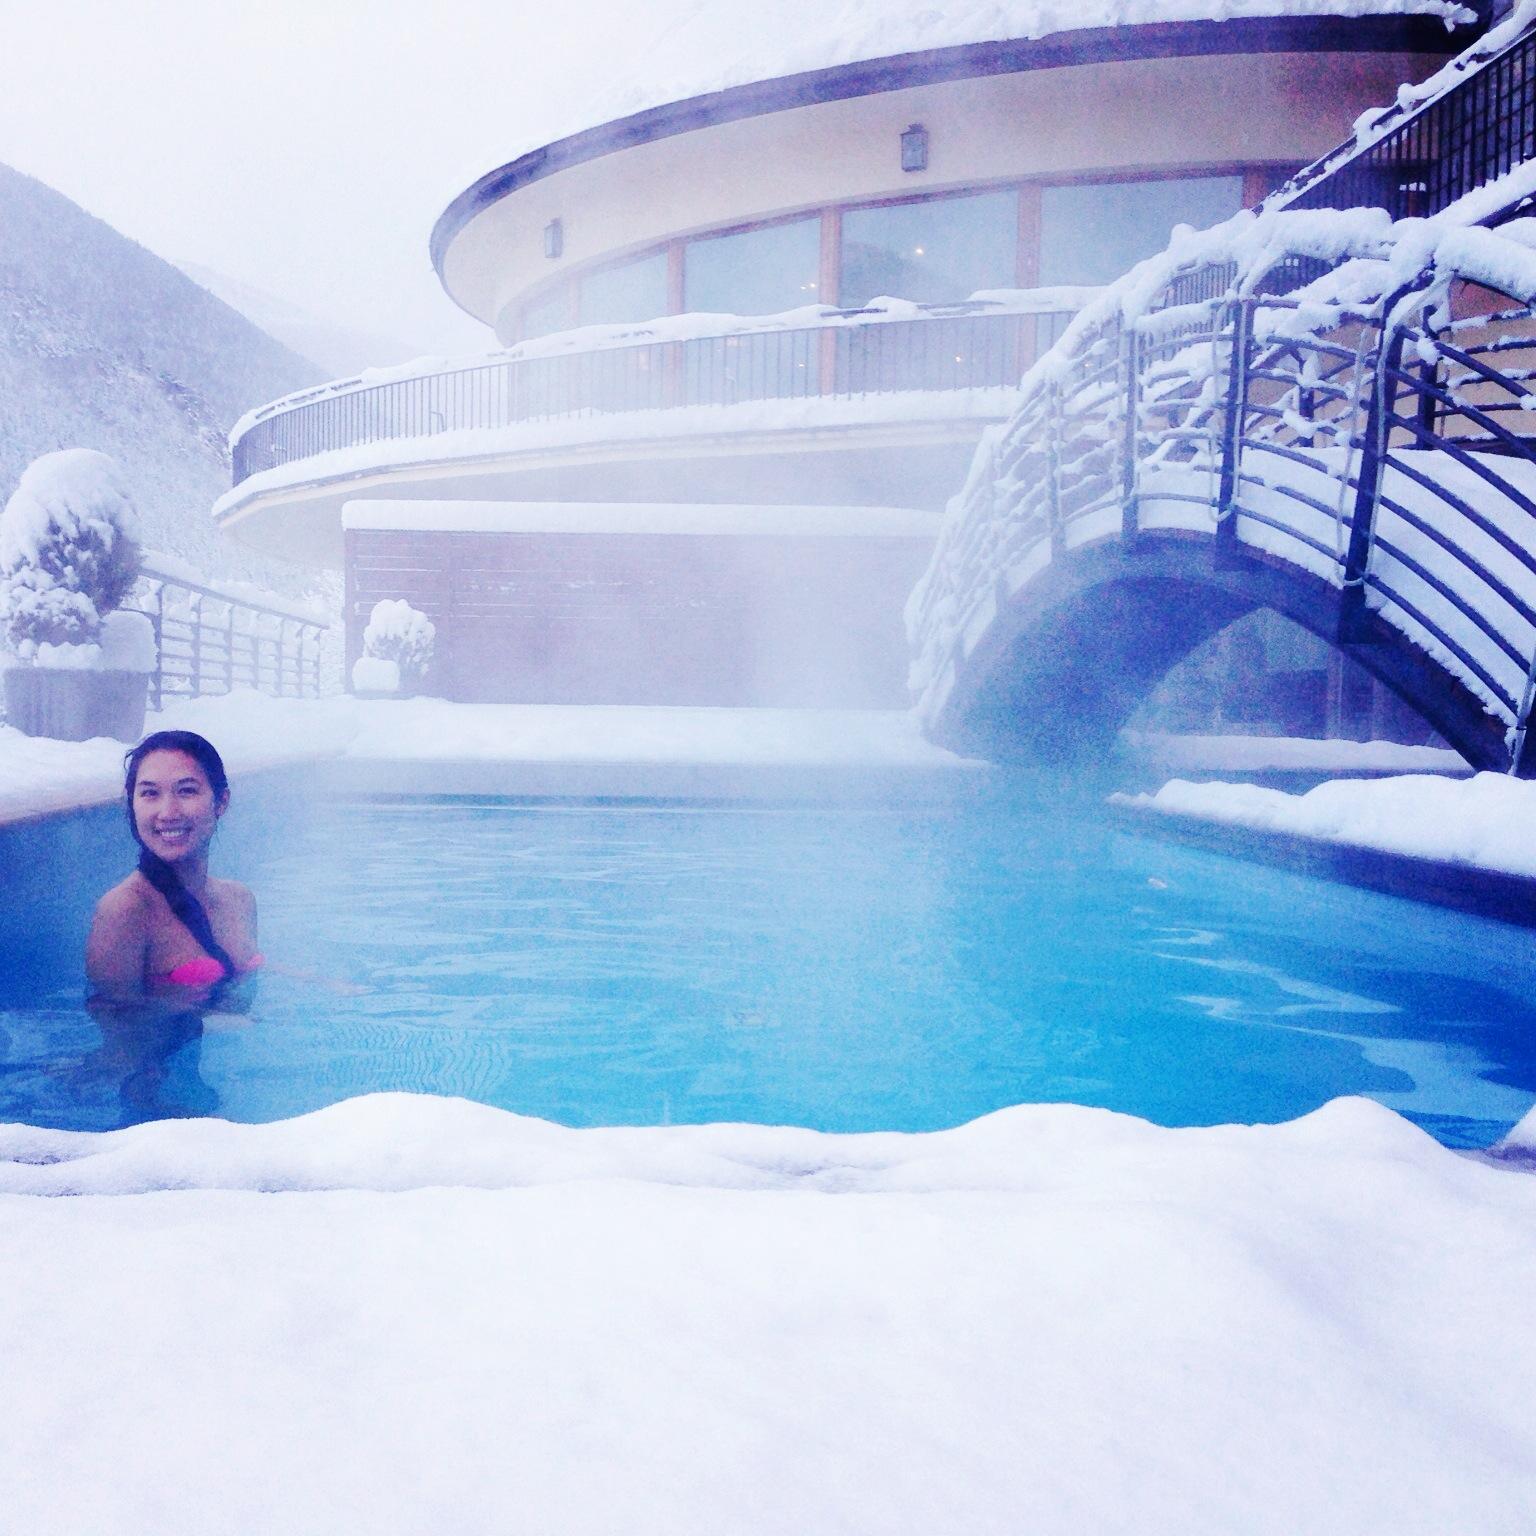 Outdoor Heated Pool at Parador de Vielha